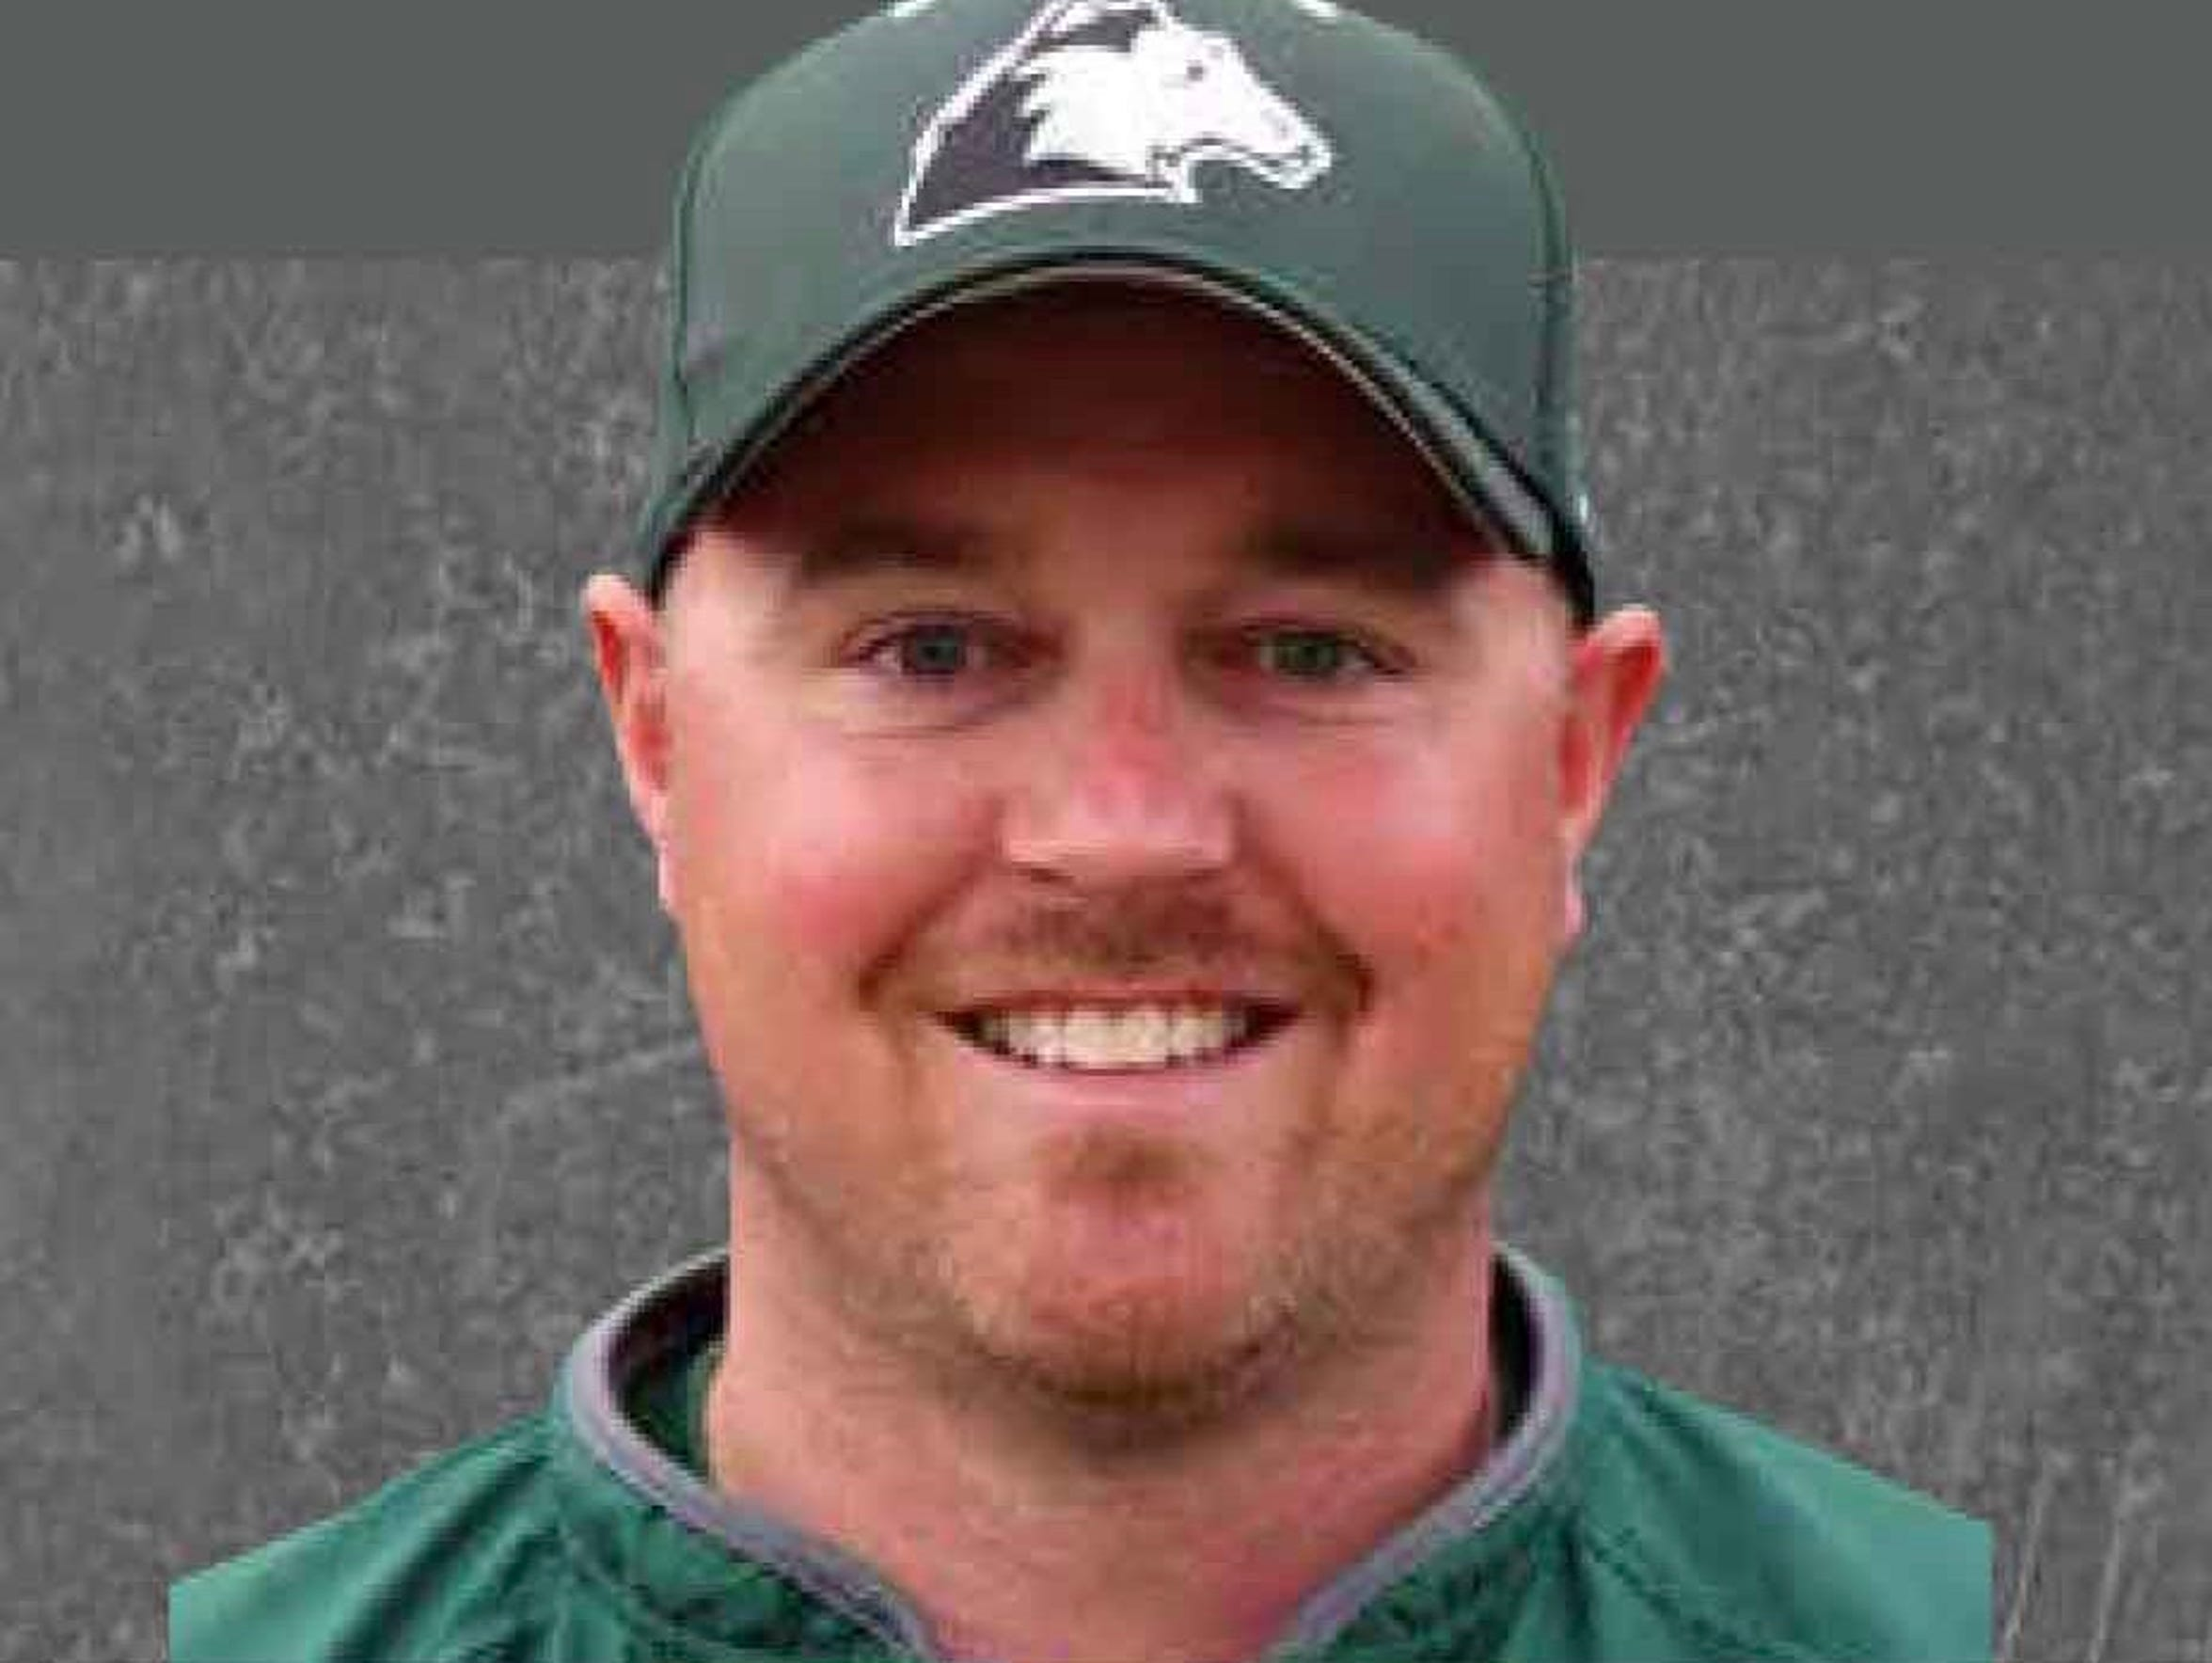 Jeremy Jones, now head coach at North, ran Bosse's program for several seasons.